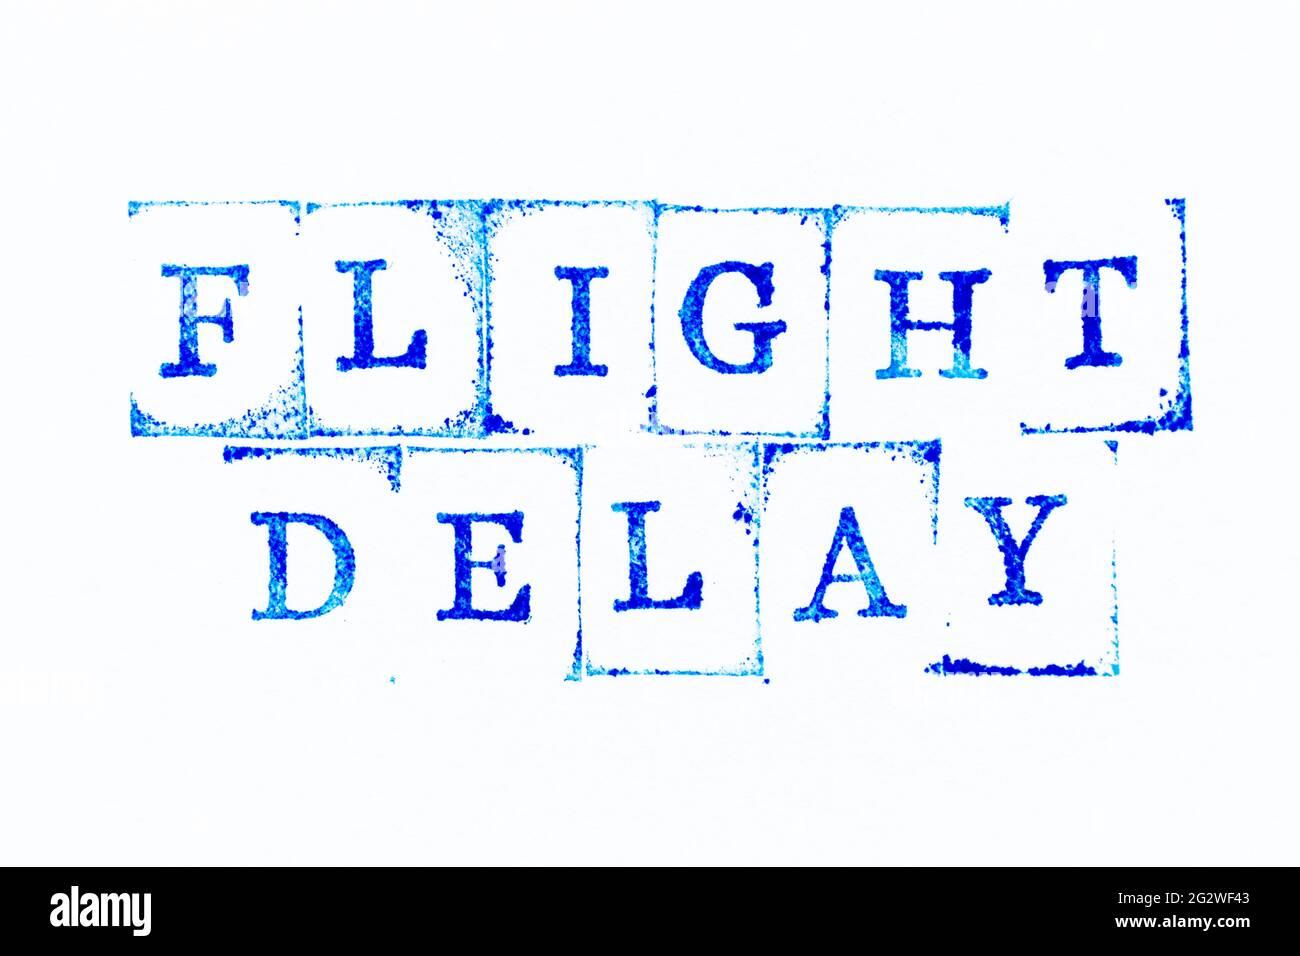 Sello de goma de tinta de color azul en retardo de vuelo de palabra sobre fondo de papel blanco Foto de stock